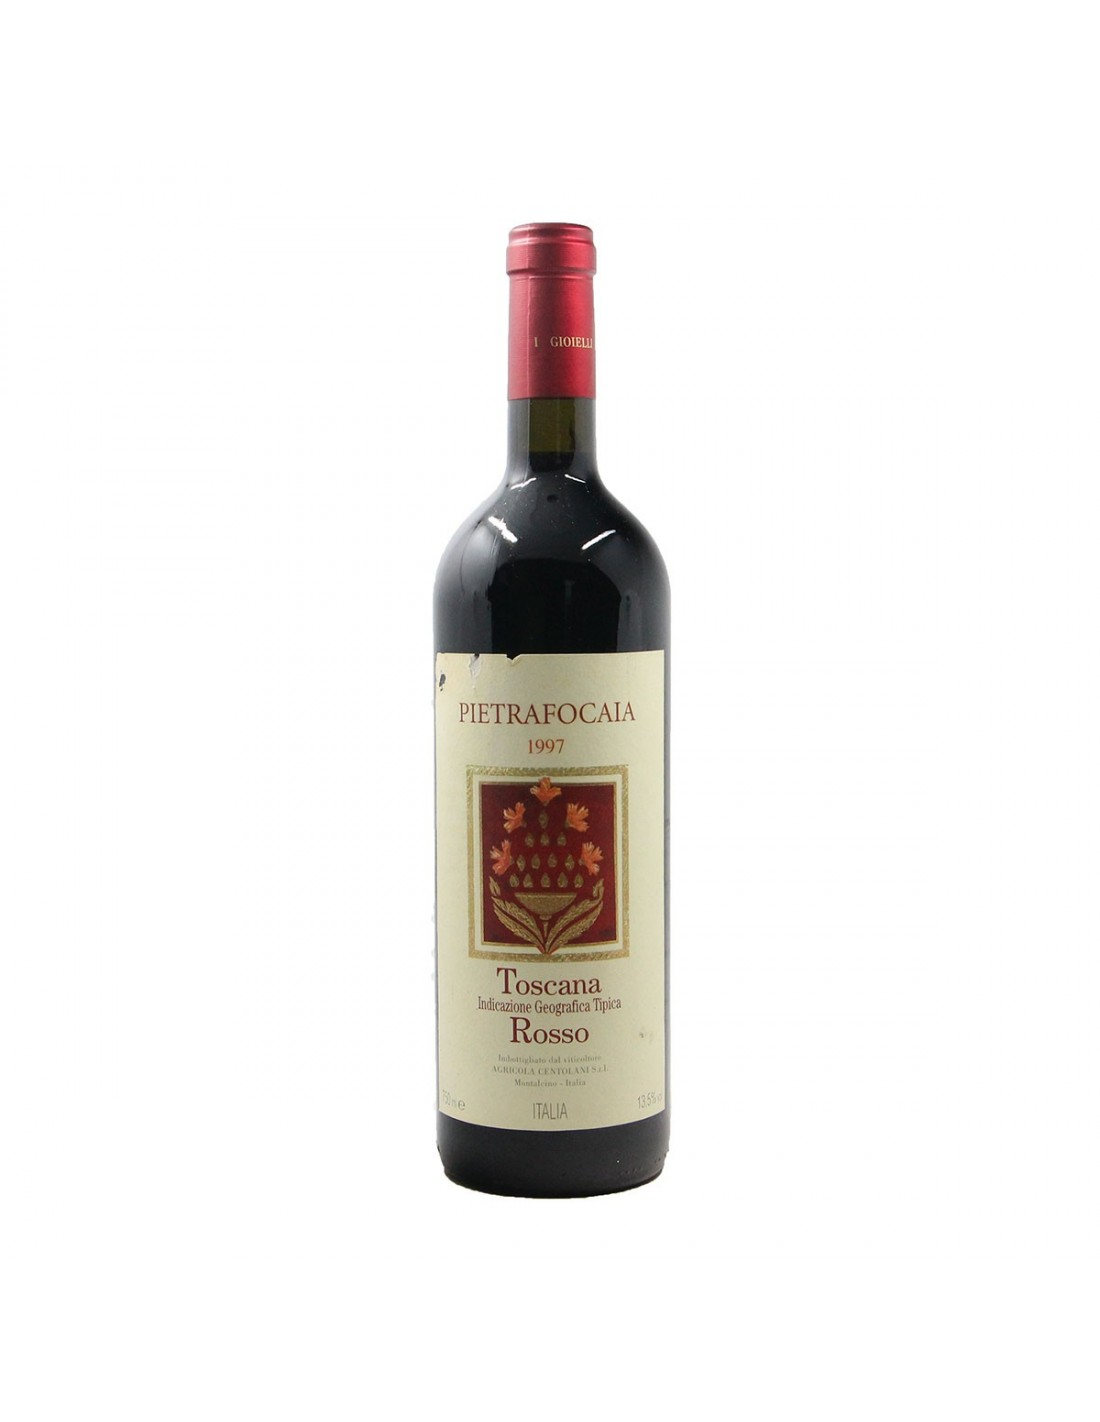 PIETRAFOCAIA 1997 CENTOLANI Grandi Bottiglie